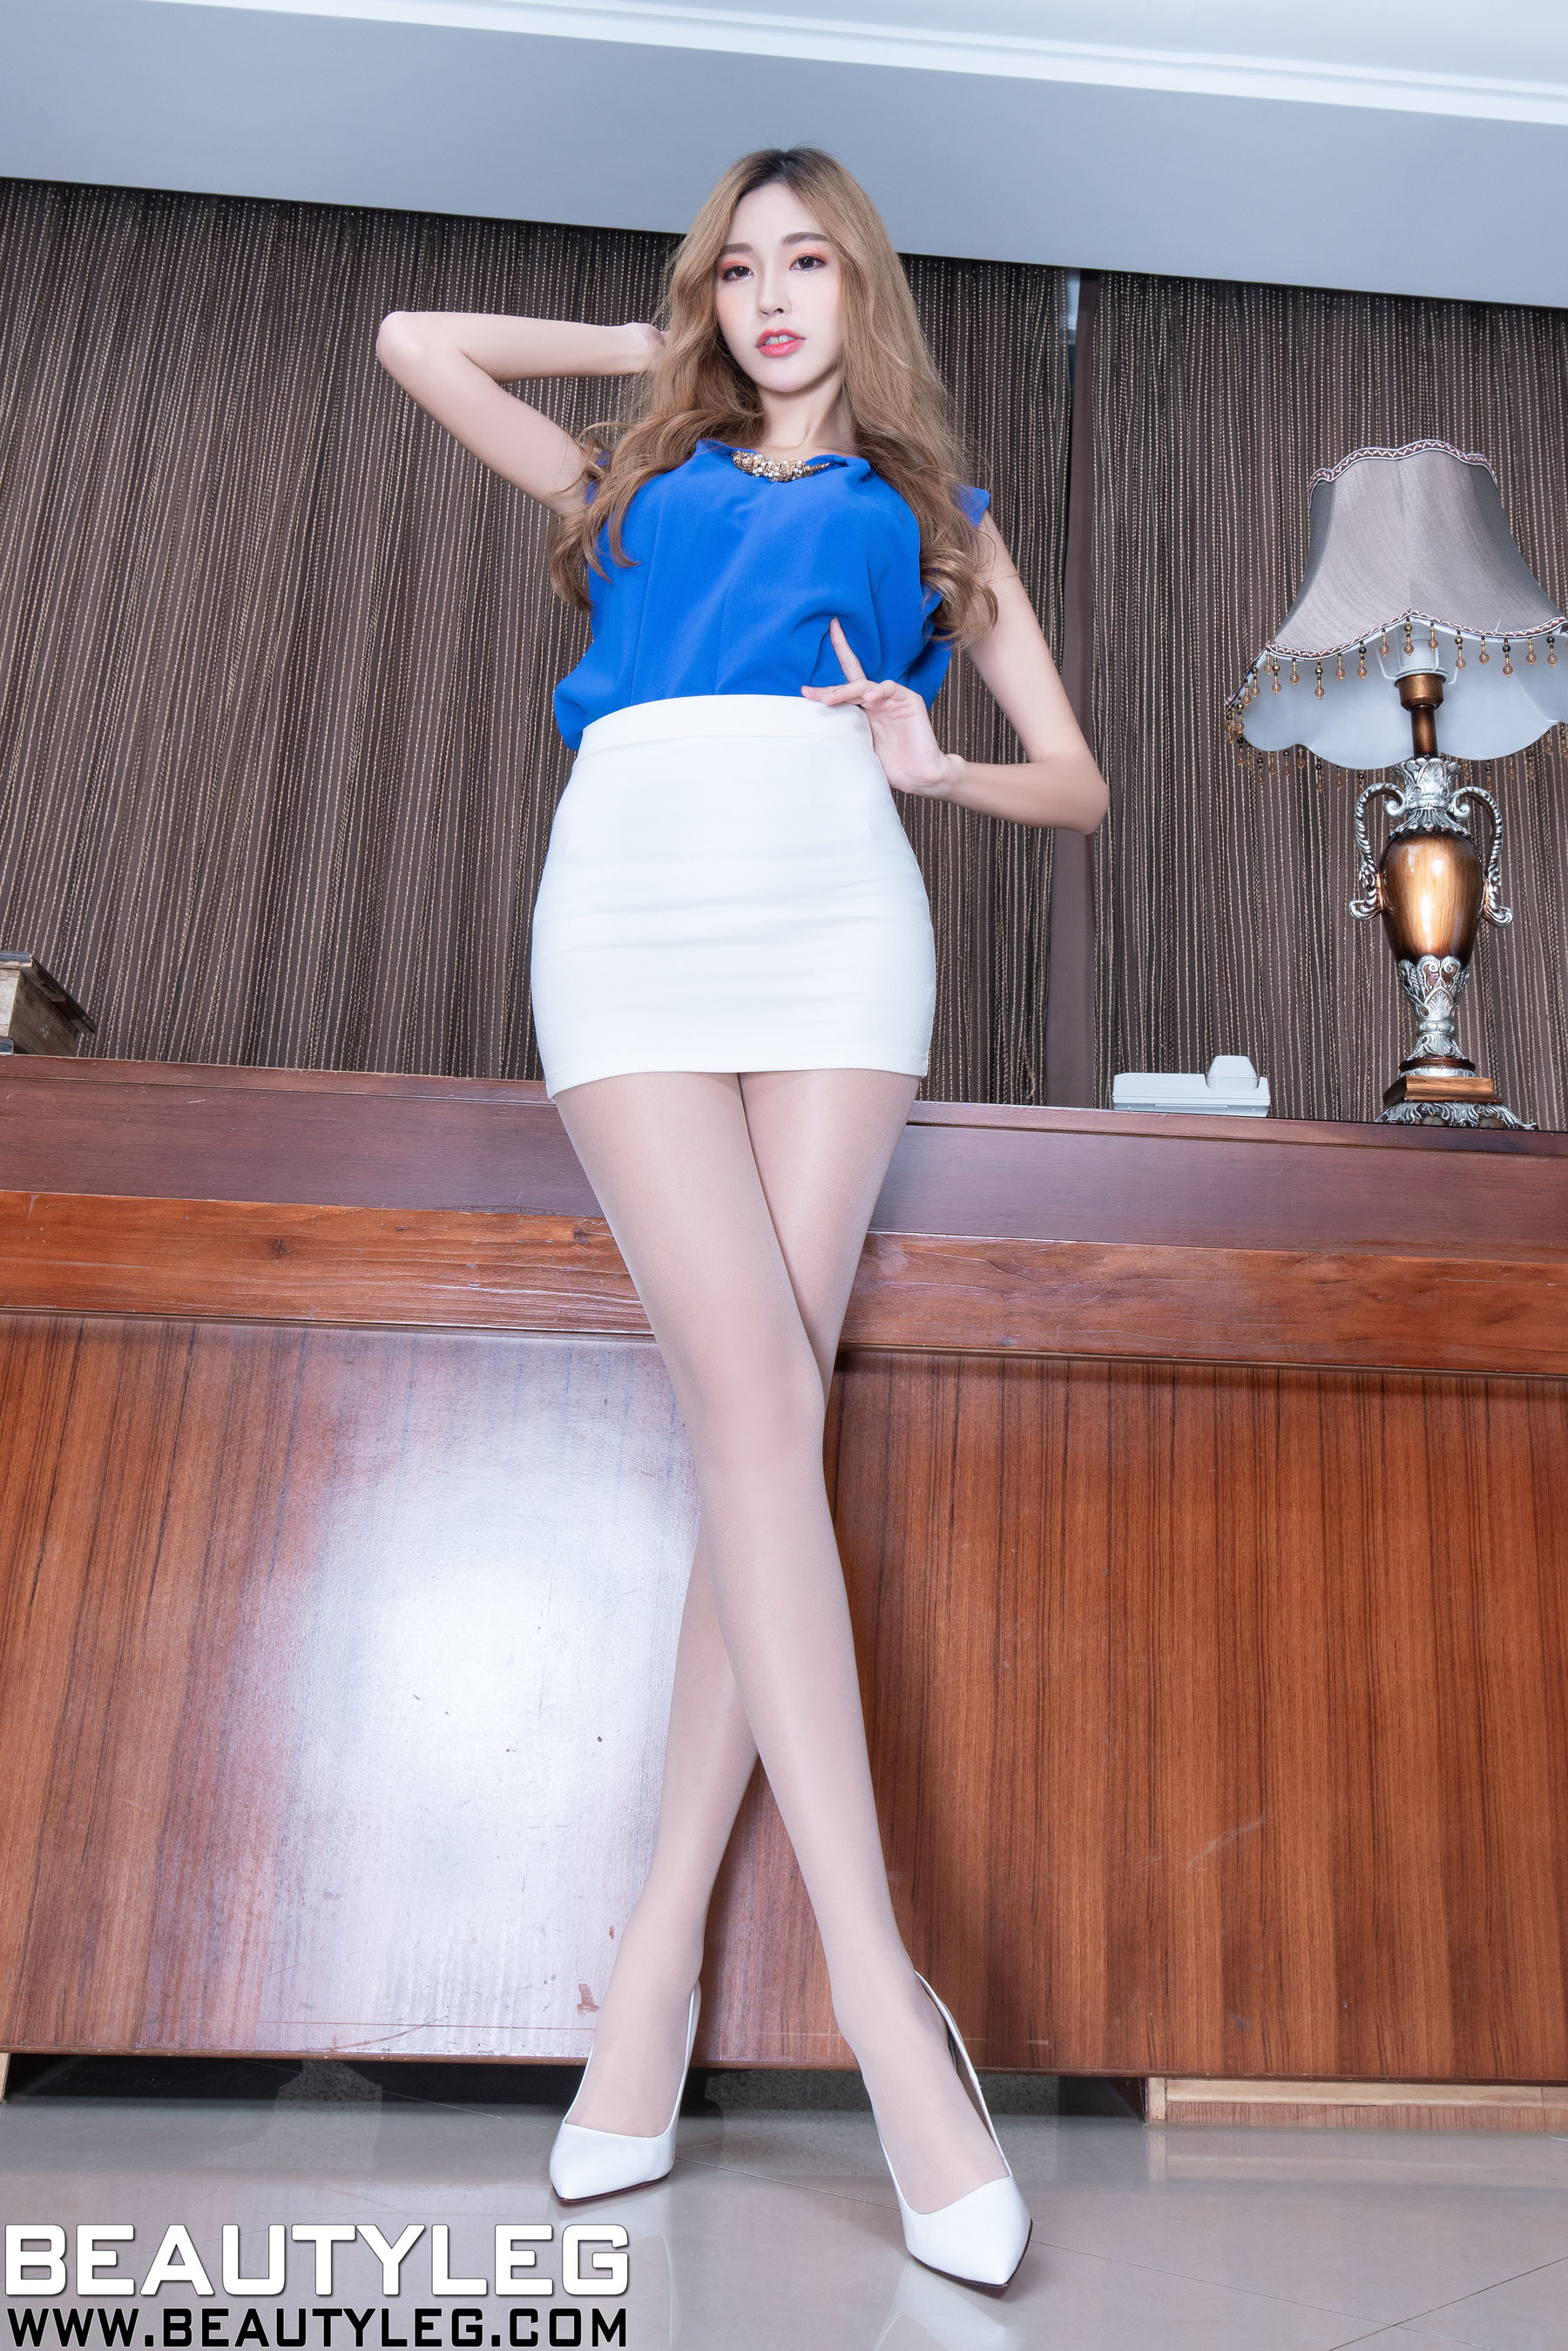 VOL.455 [Beautyleg]超短裙制服丝袜美腿:黄上晏(黄上晏Rubis)超高清个人性感漂亮大图(48P)